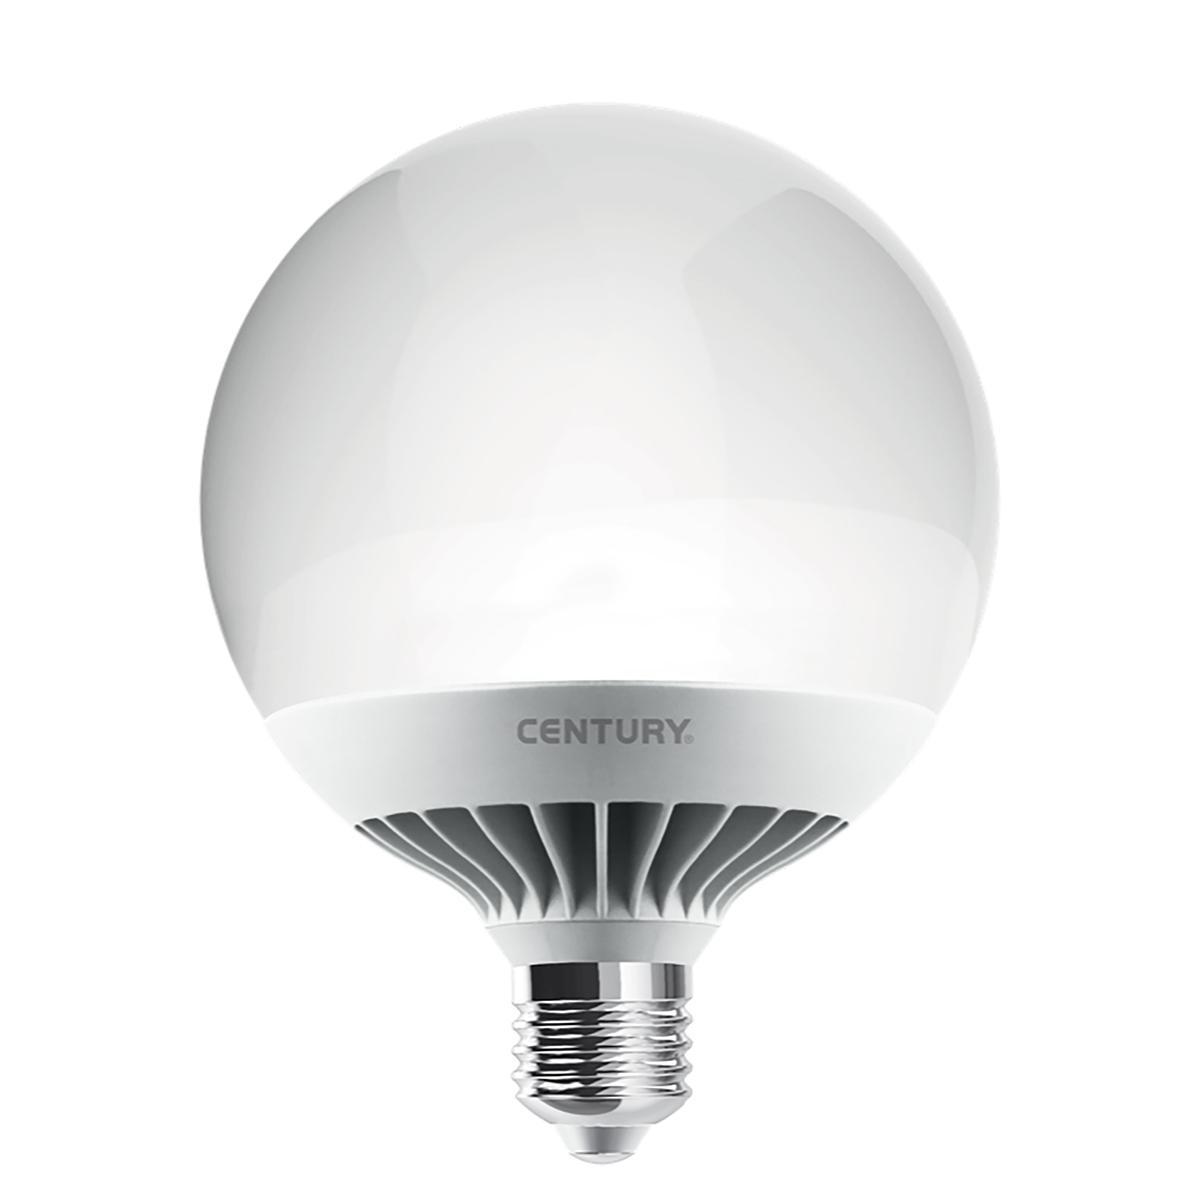 led-lampe-e27-globe-20-w-1800-lm-3000-k